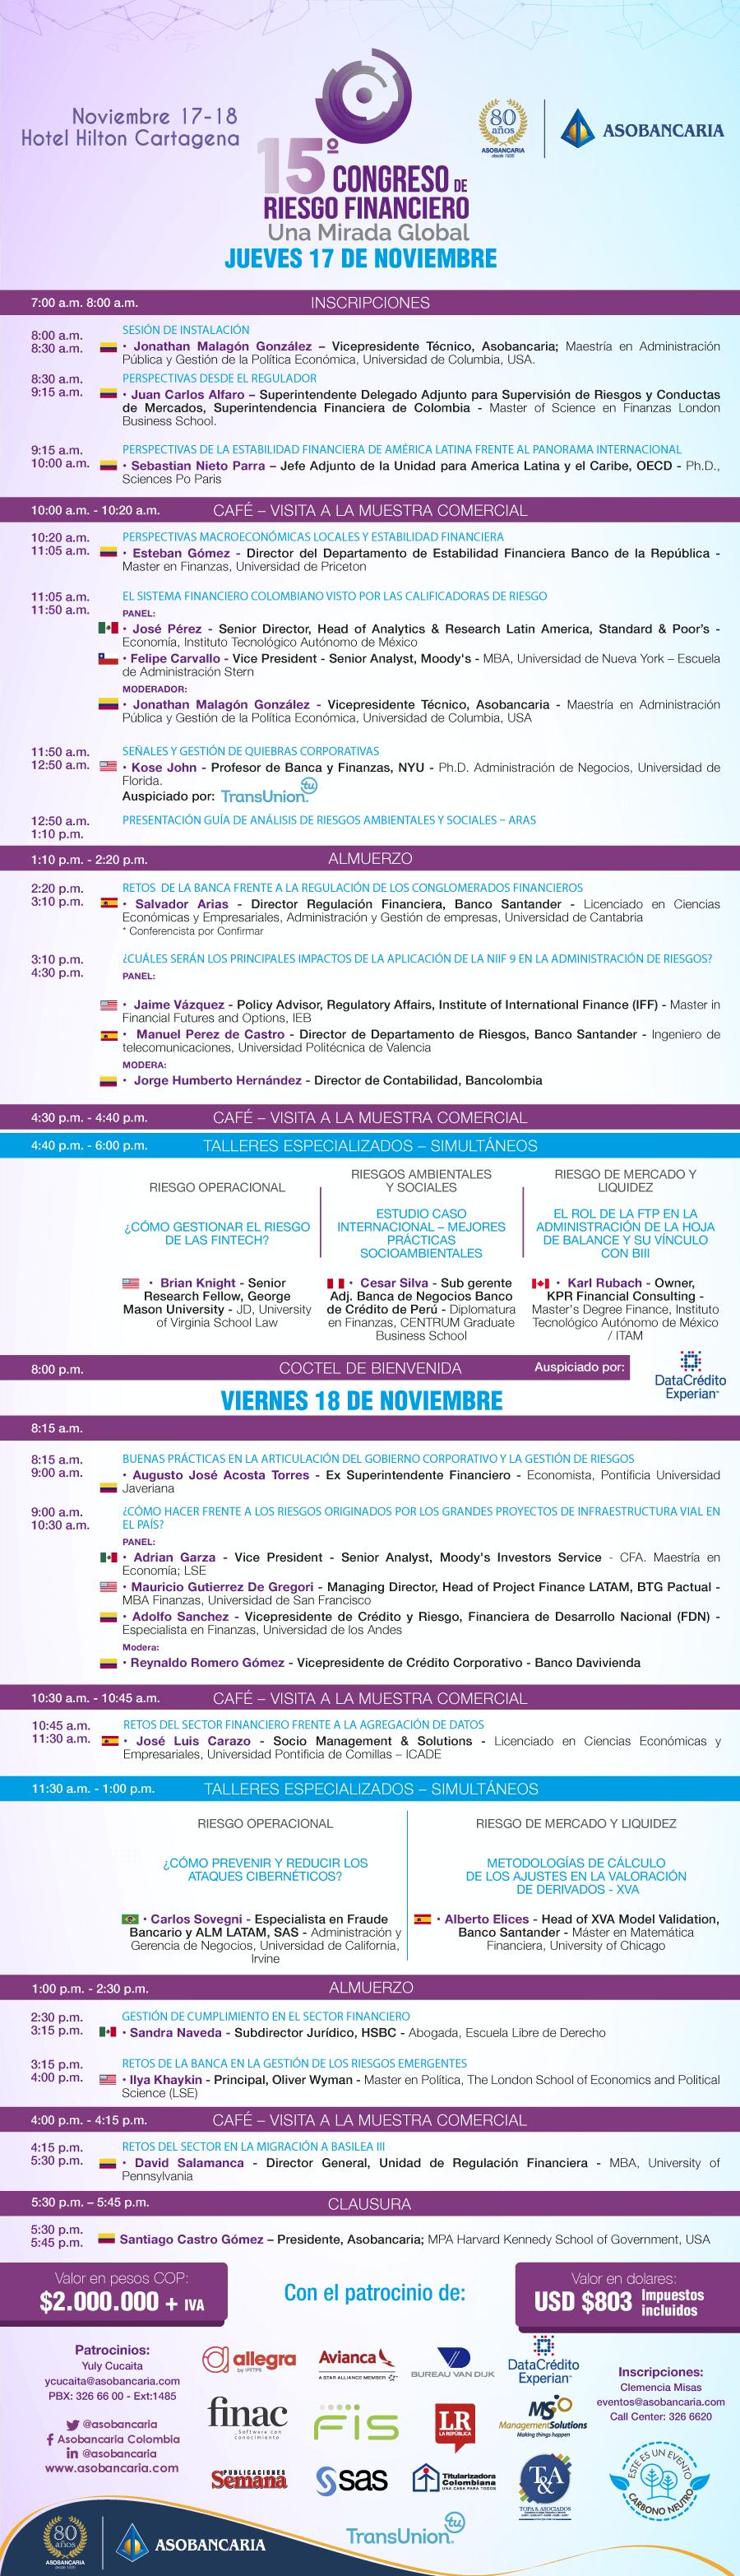 Agenda-15-CONGRESO-DERECHO-Fin-WEB--9